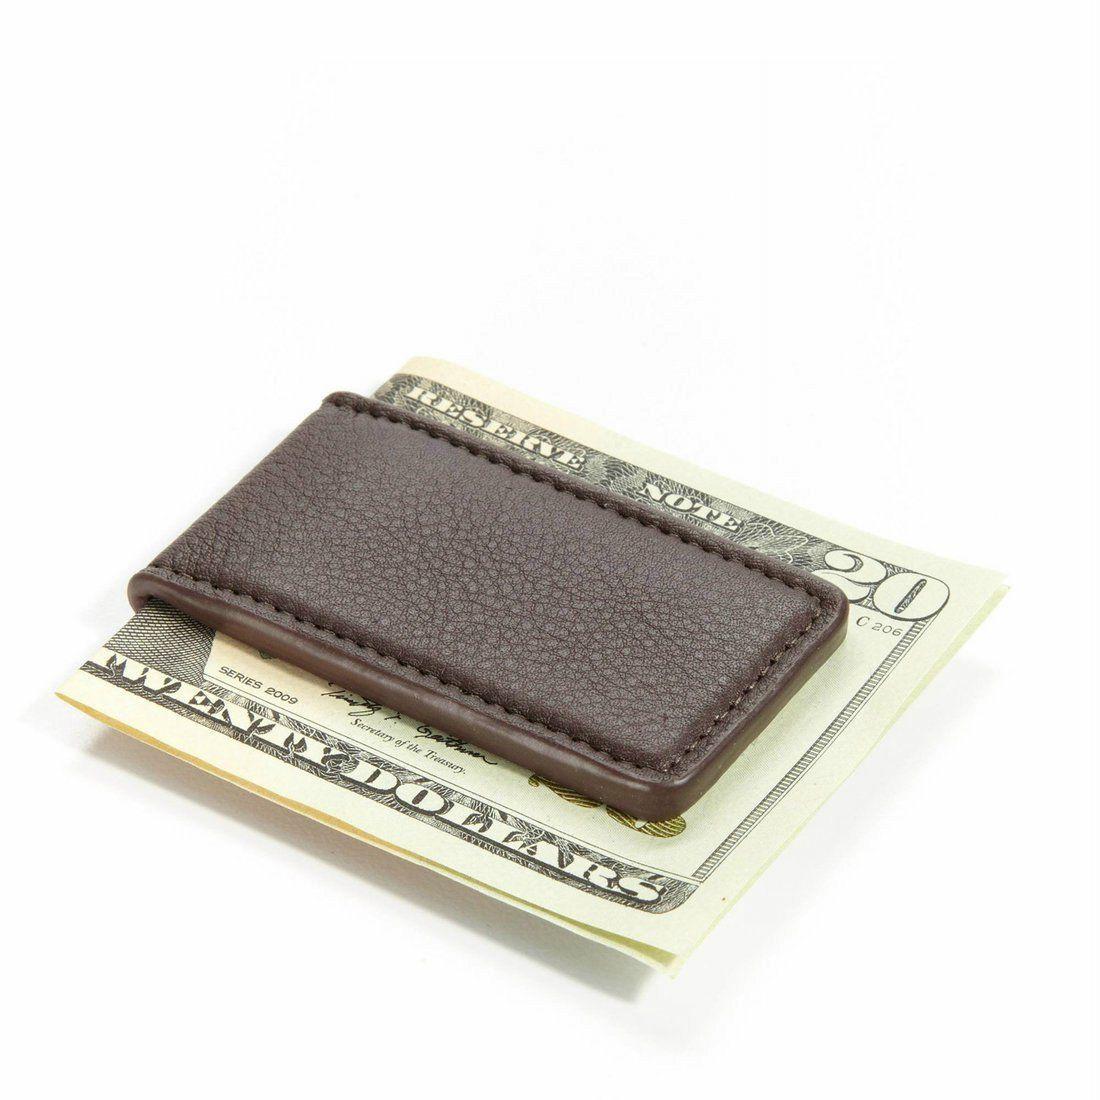 magnetic-money-clip-brown-112-227_nzoom-money